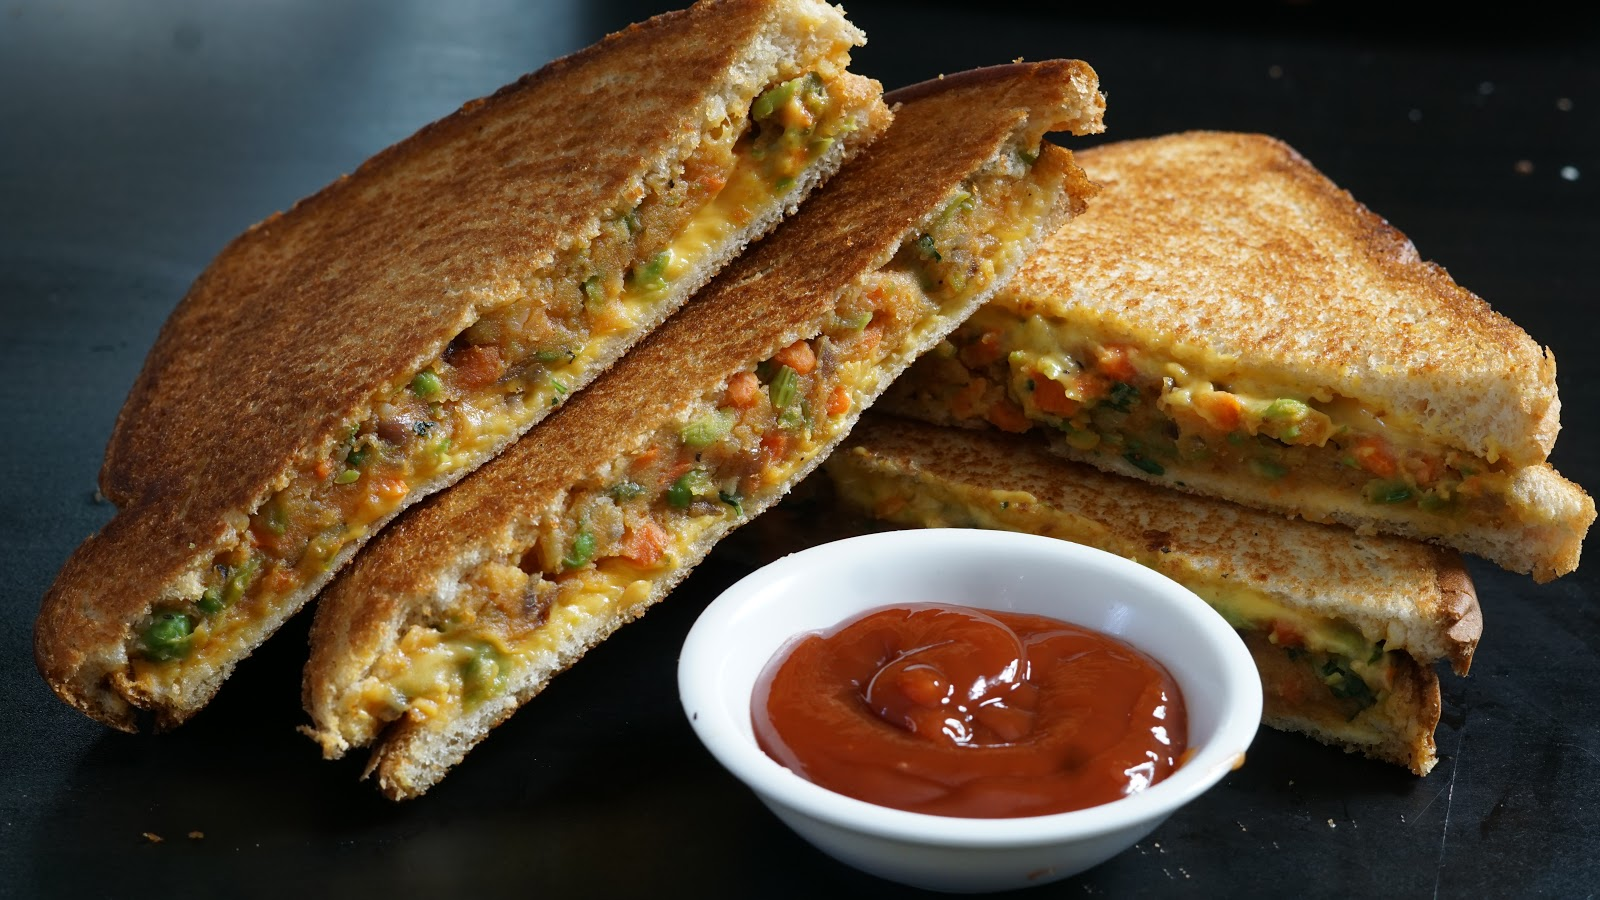 Cake Recipes In Madras Samayal: Vegetable Sandwich Recipe